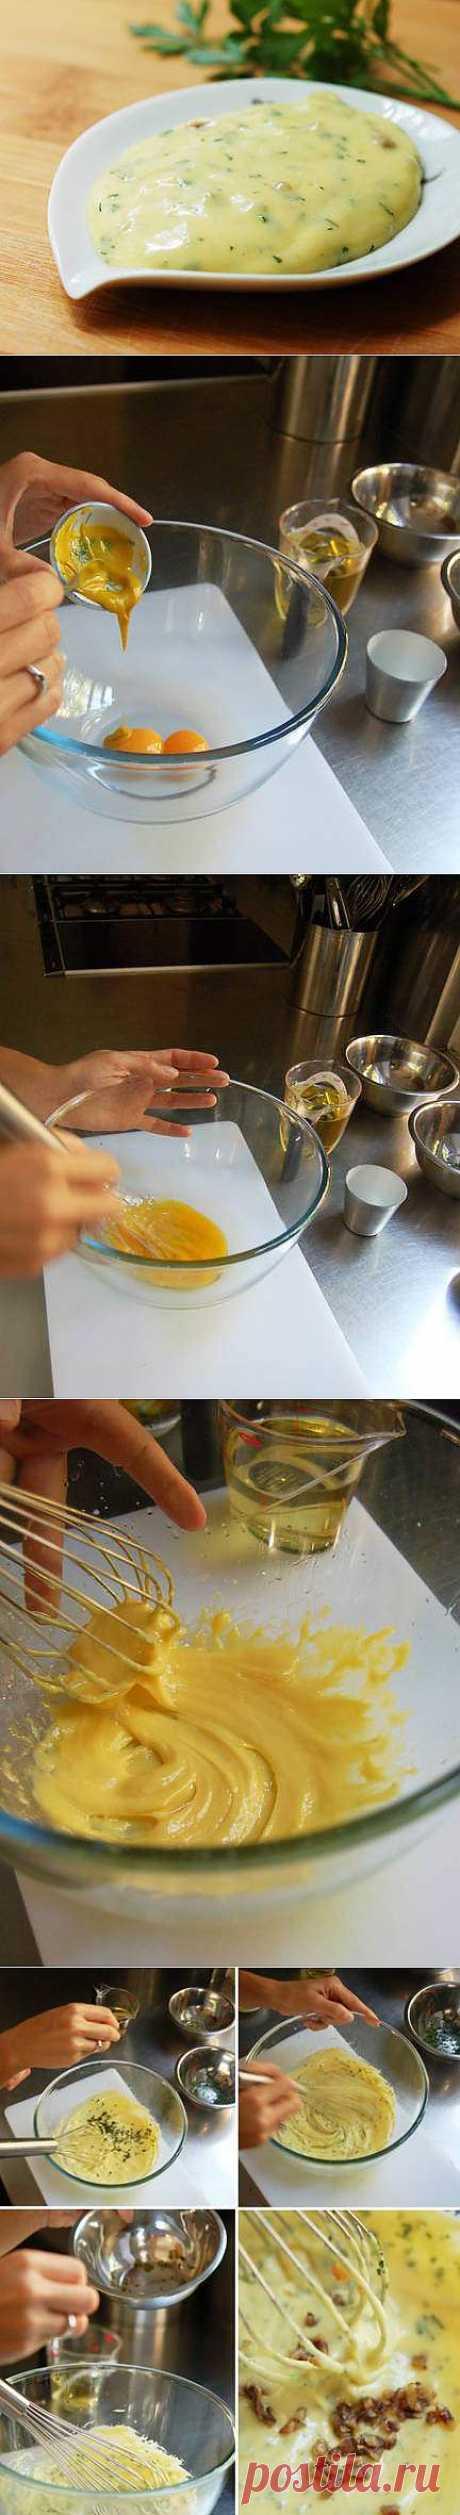 Домашний майонез - рецепт с фото - Рецепты с фото